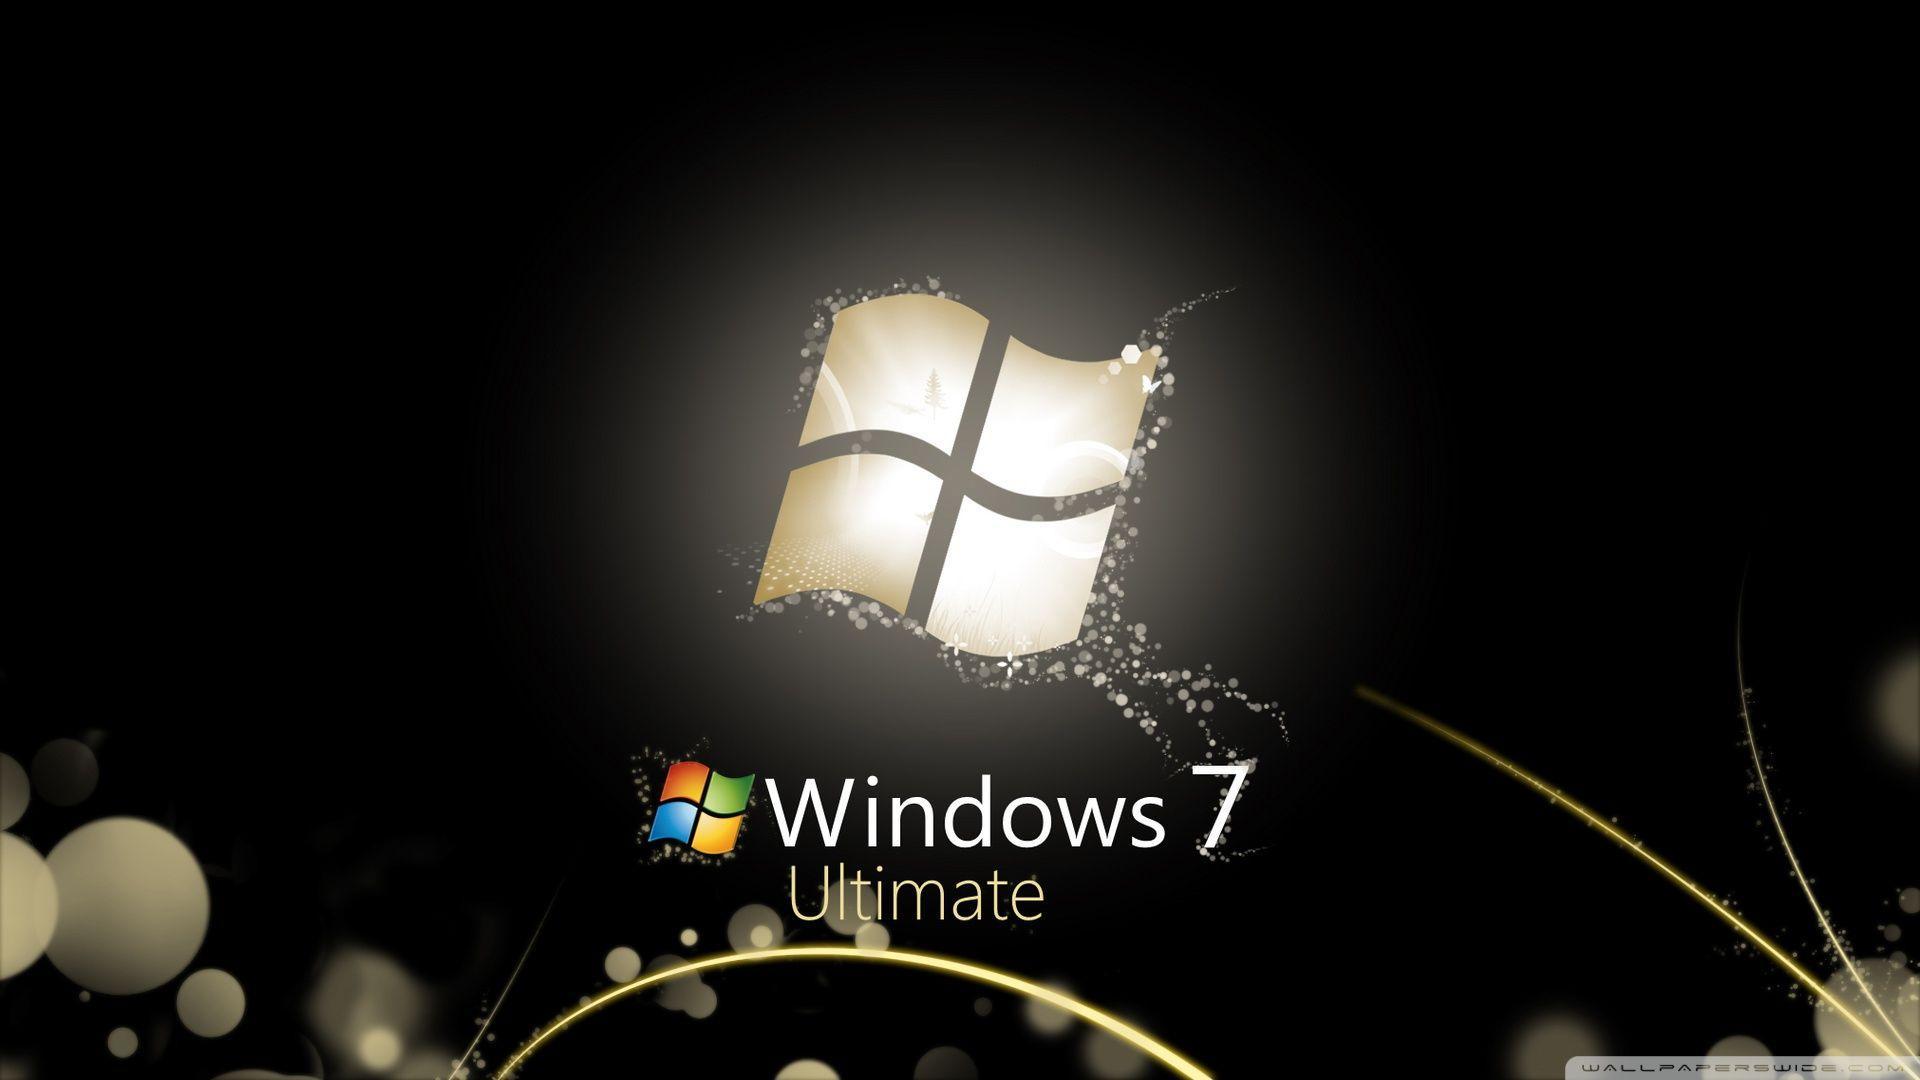 Windows 7 Hd Wallpapers Top Free Windows 7 Hd Backgrounds